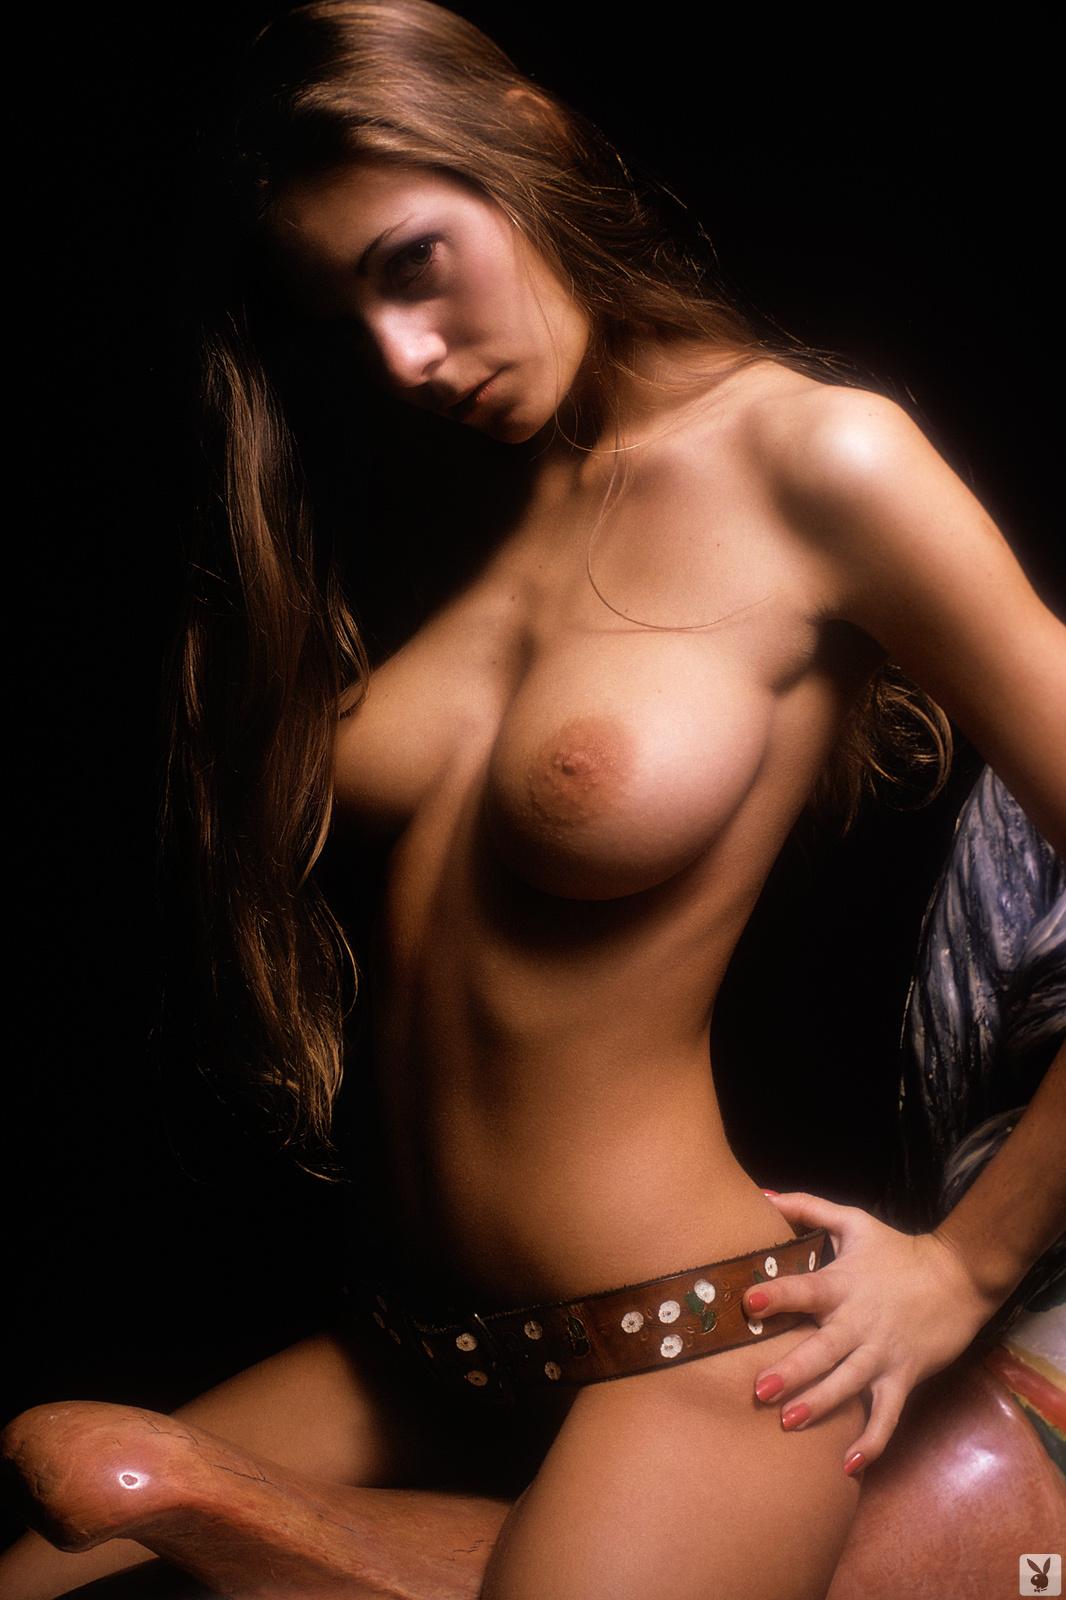 sandy johnson nude